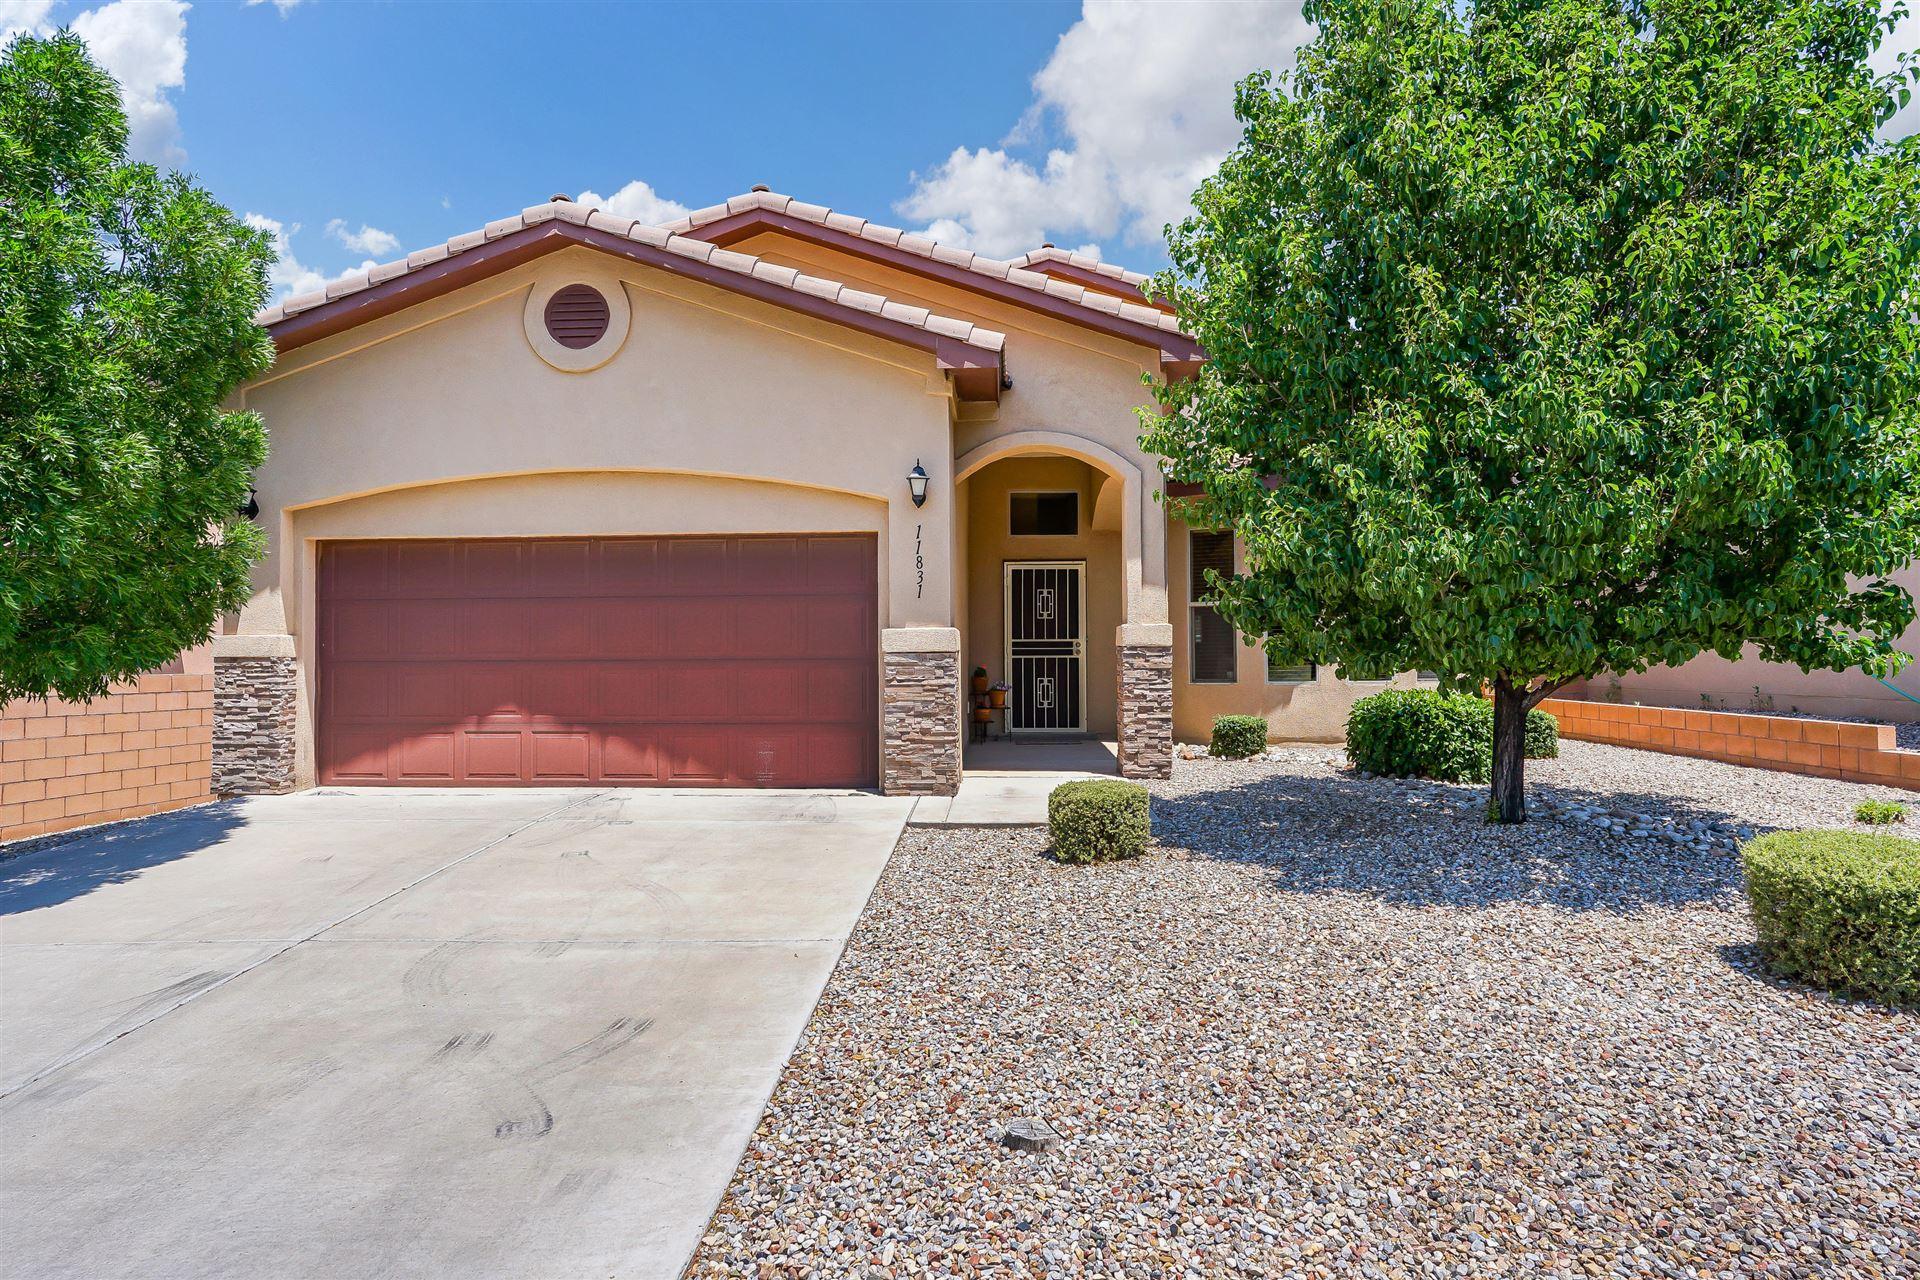 Photo of 11831 POCONO Road SE, Albuquerque, NM 87123 (MLS # 994732)